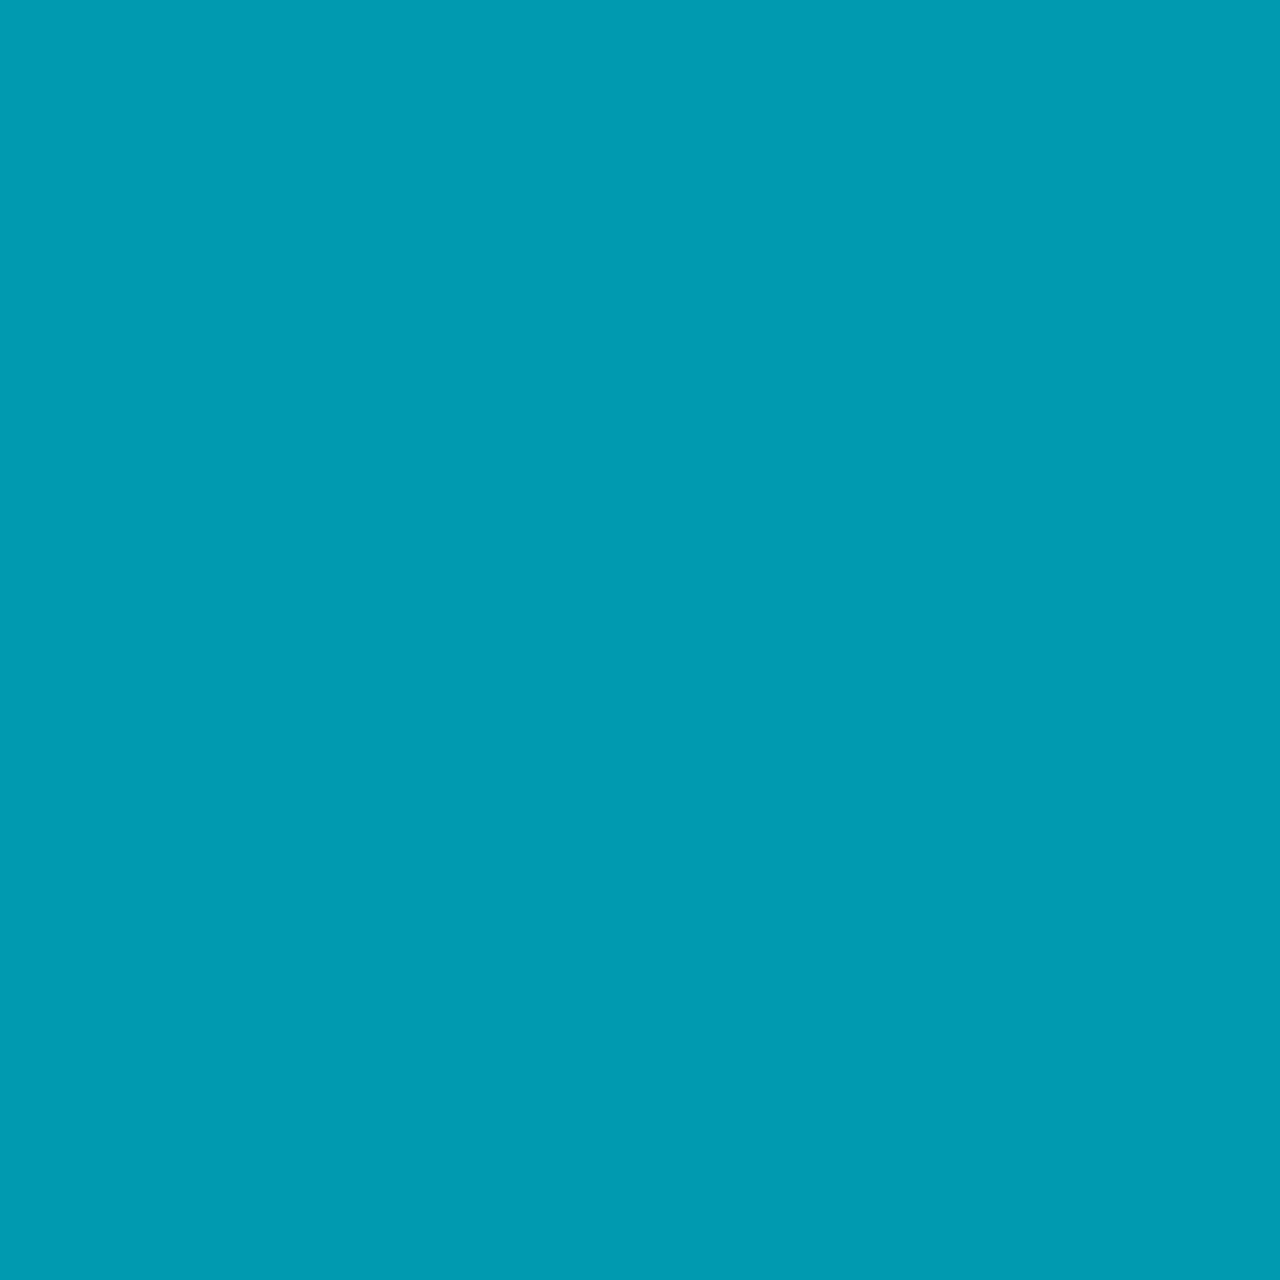 "#0370 Rosco Gels Roscolux Italian Blue, 20x24"""